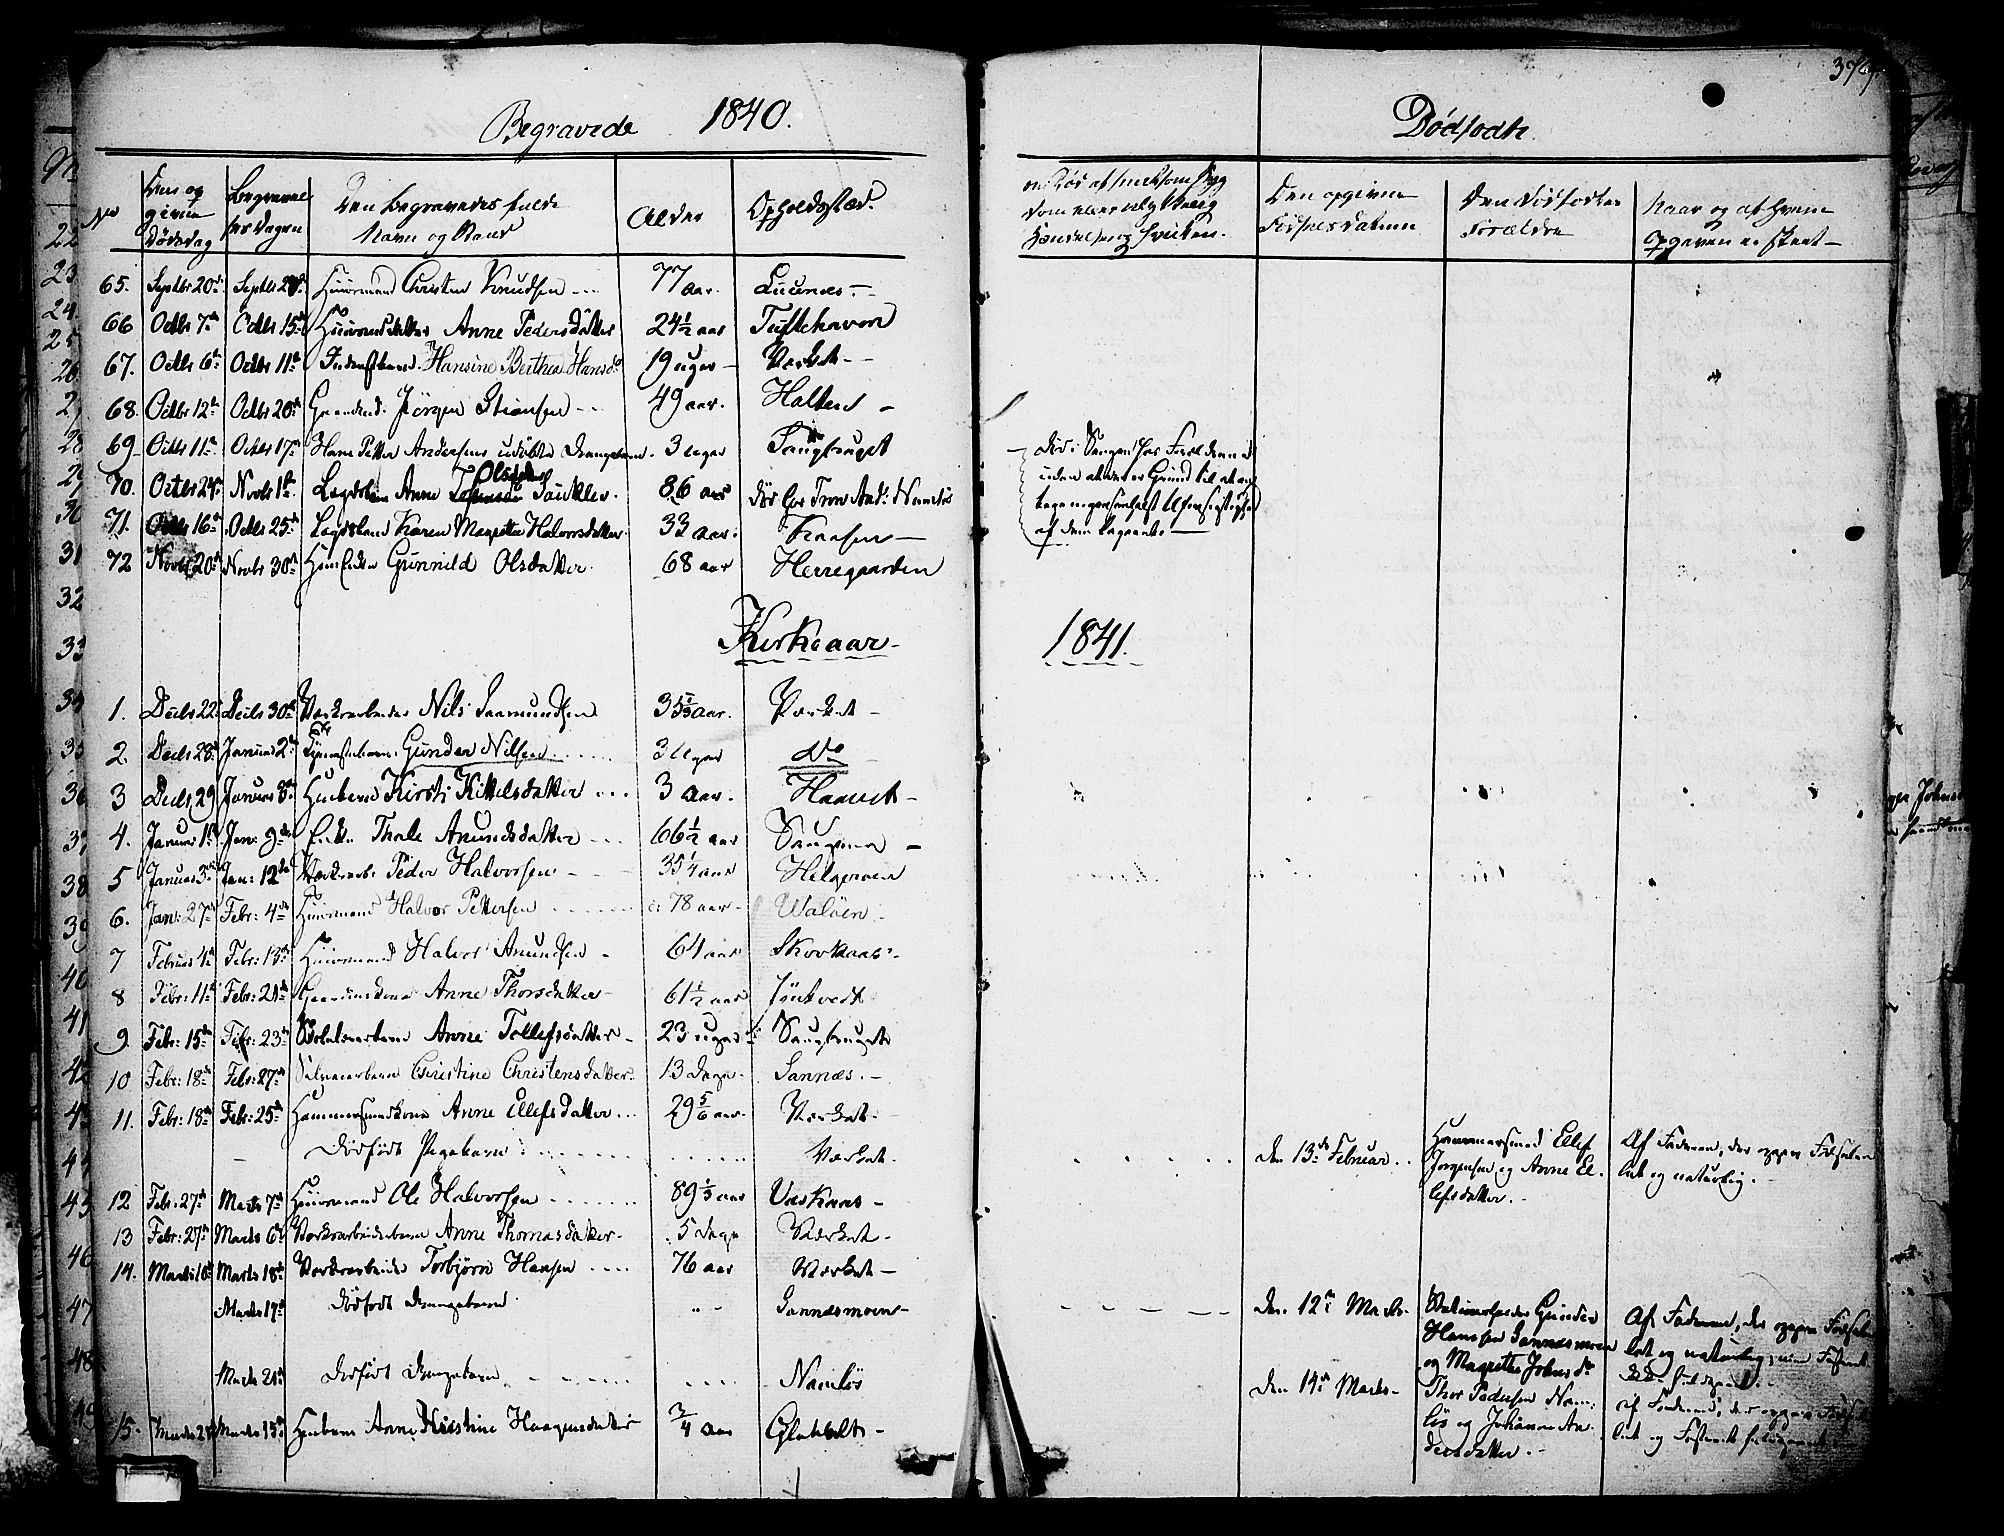 SAKO, Holla kirkebøker, F/Fa/L0004: Ministerialbok nr. 4, 1830-1848, s. 379